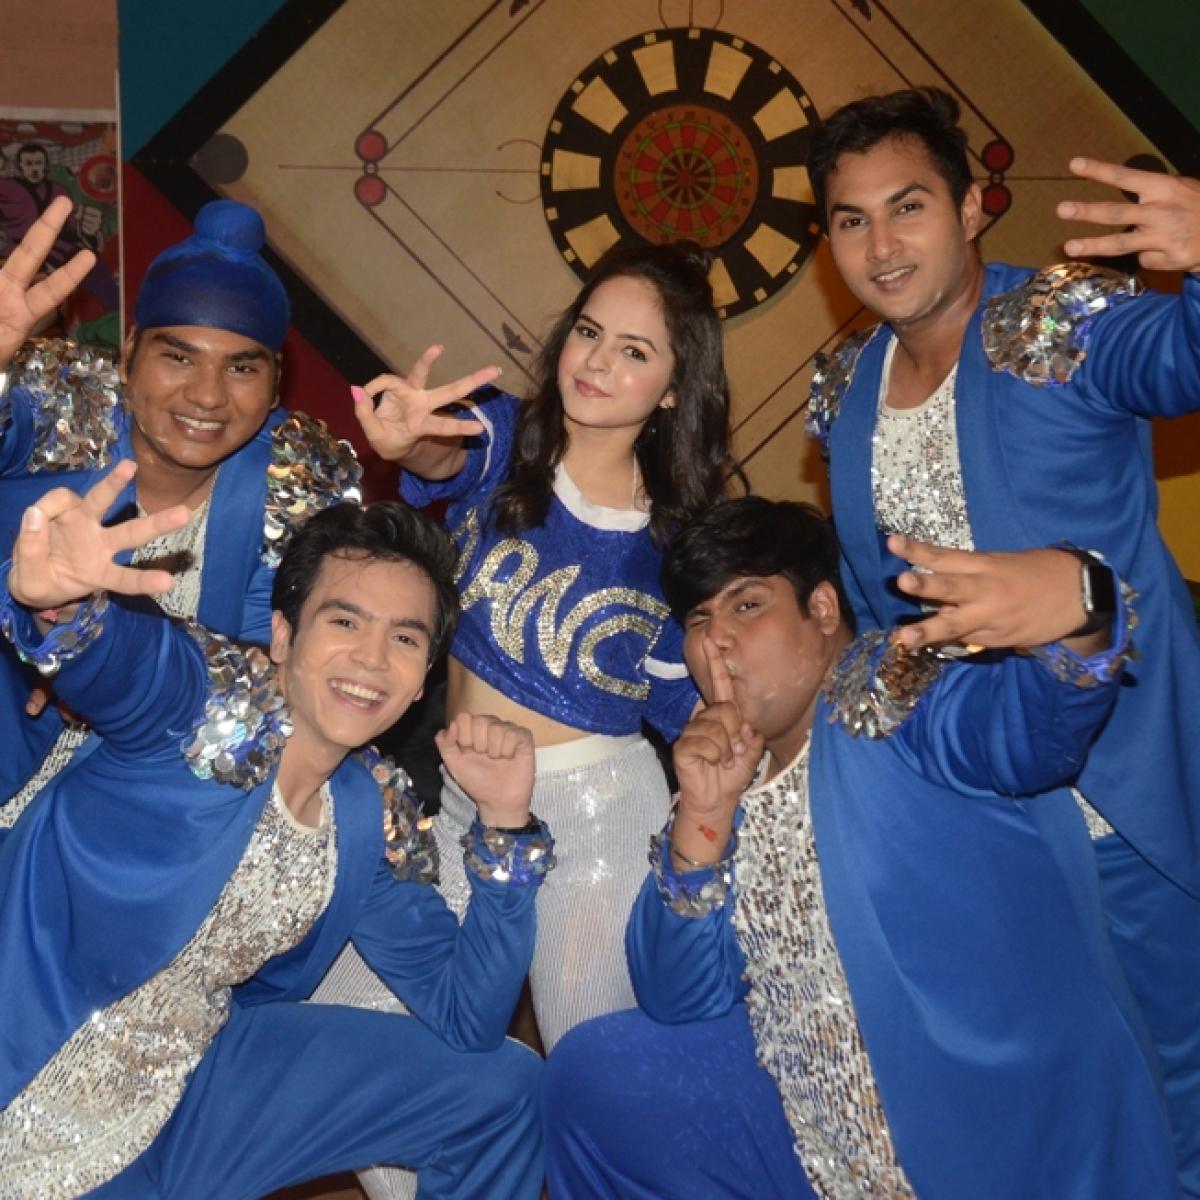 Shraddha Kapoor, Varun Dhawan surprise Tapu sena on 'Taarak Mehta Ka Ooltah Chashmah'